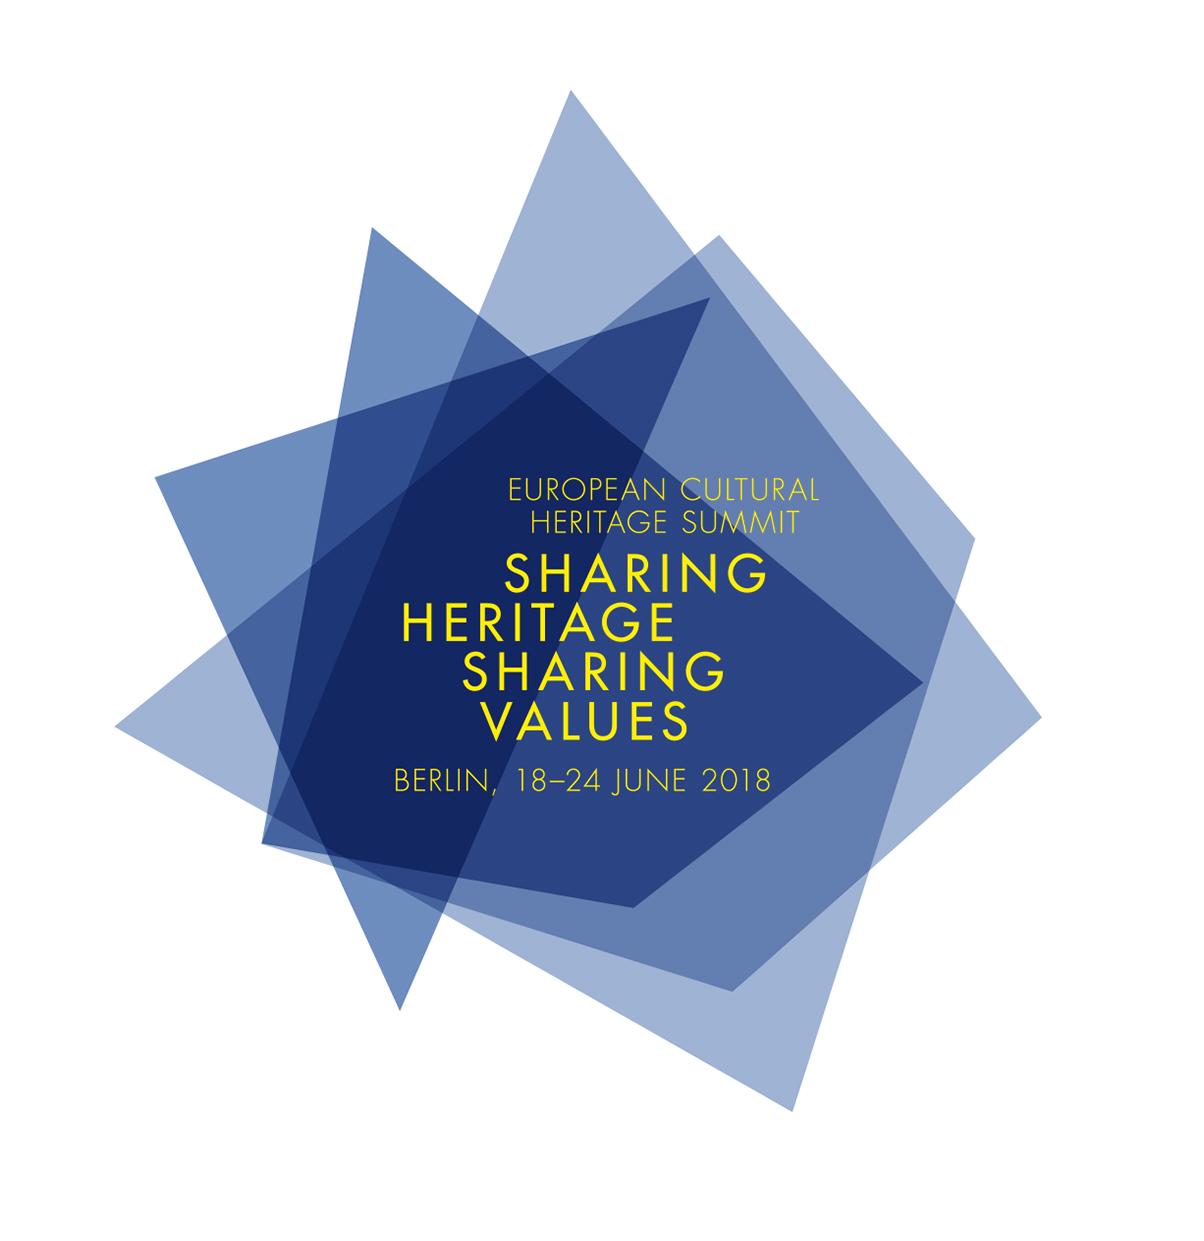 European Cultural Heritage Summit